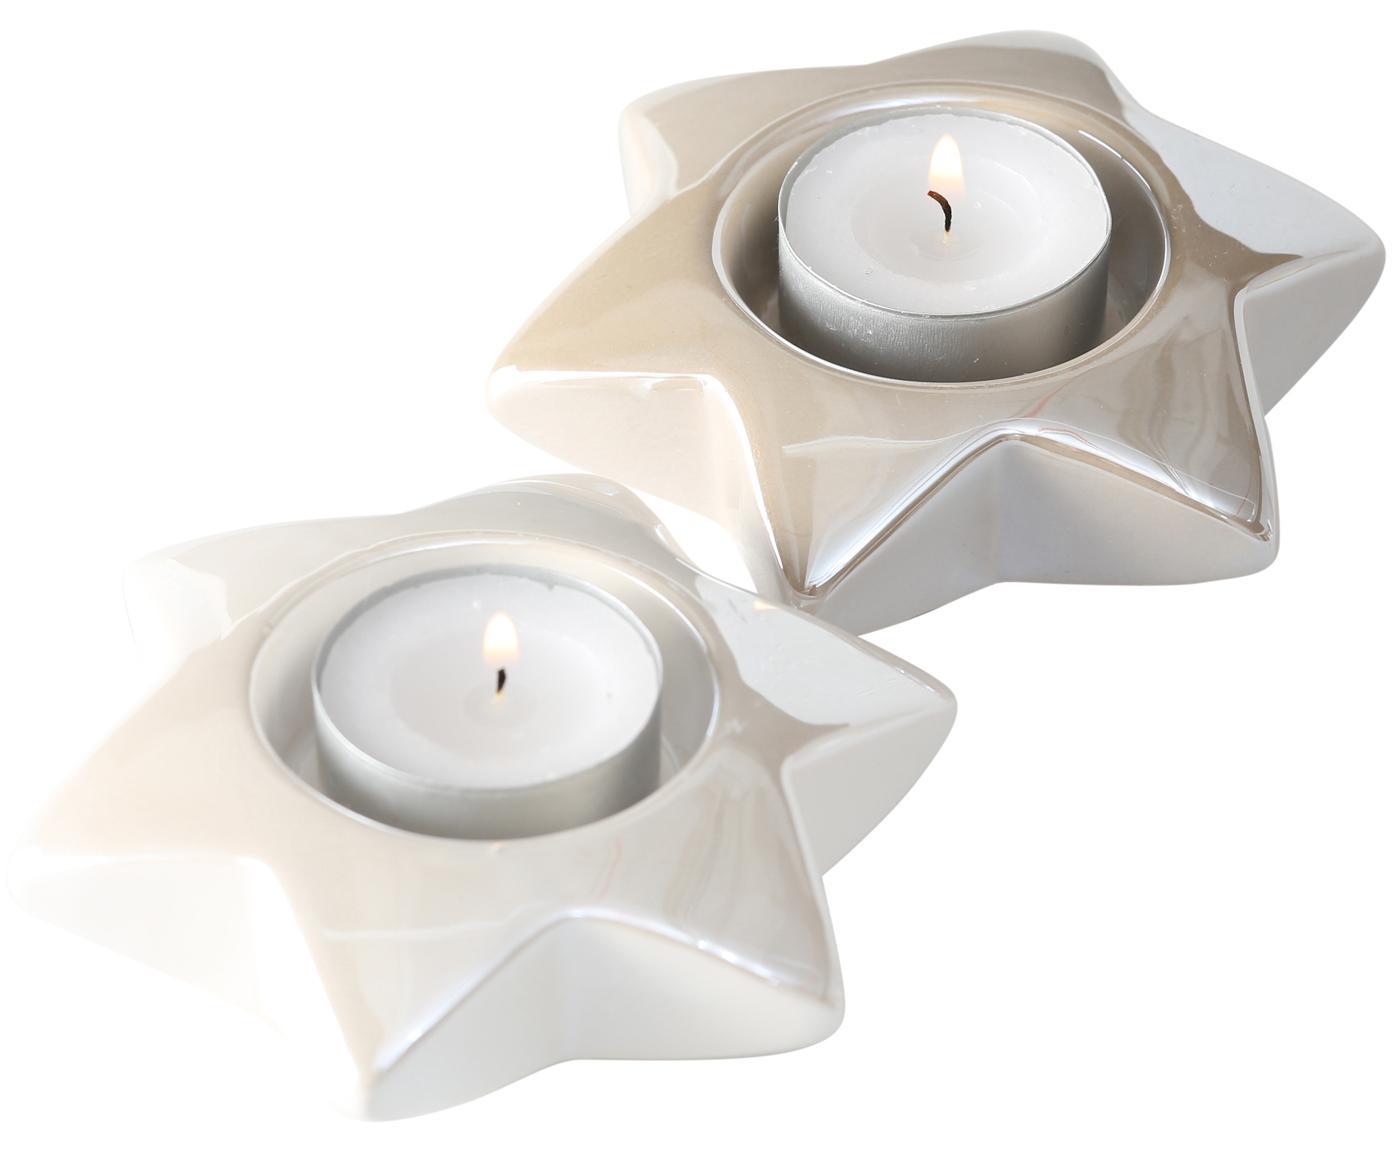 Waxinelichthoudersset Star, 2-delig, Keramiek, Crèmekleurig, beige, Ø 11 x H 3 cm